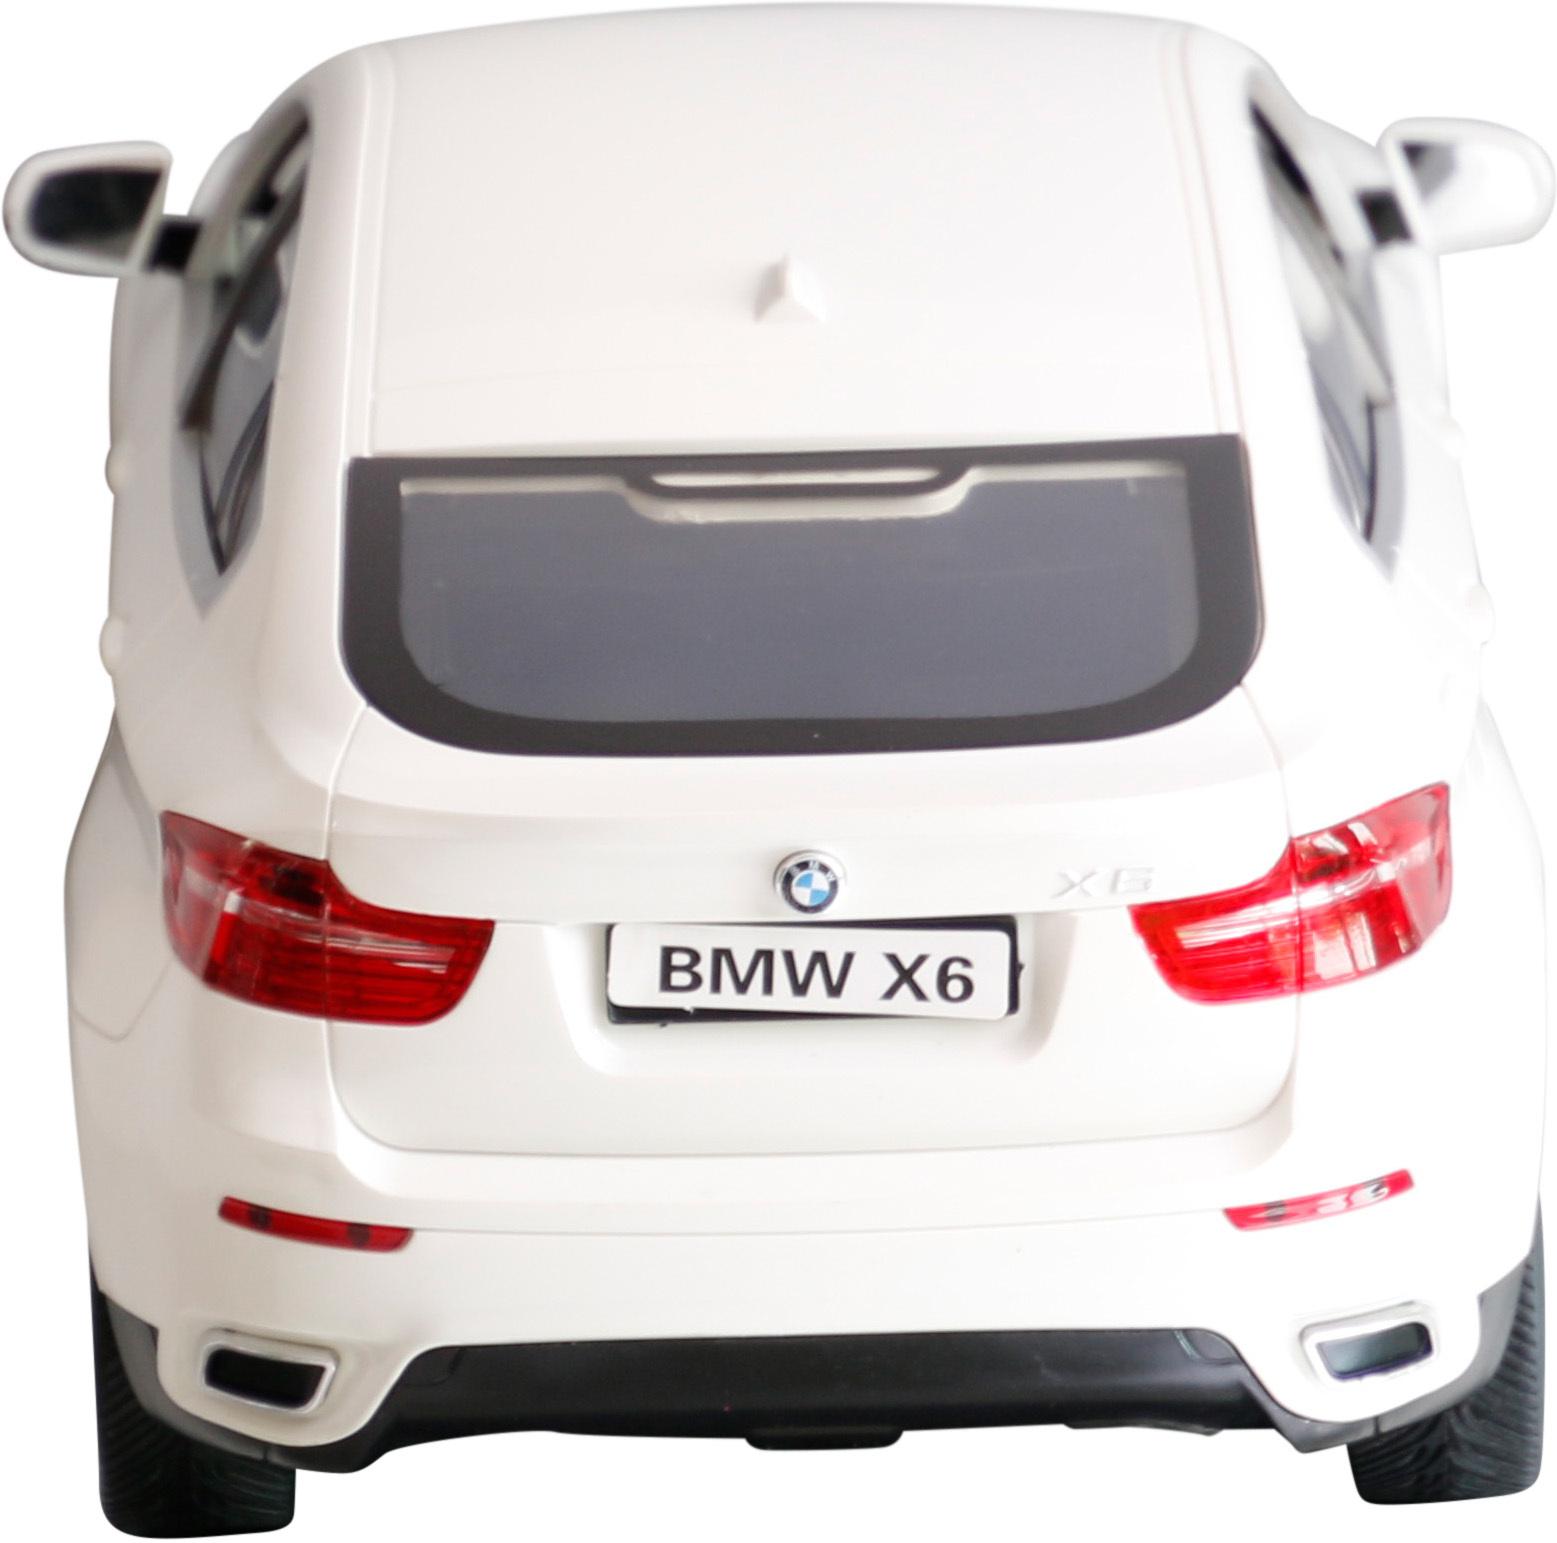 Beluga 11616 Bmw X6 118 Ferngesteuert Online Kaufen Stylekistede